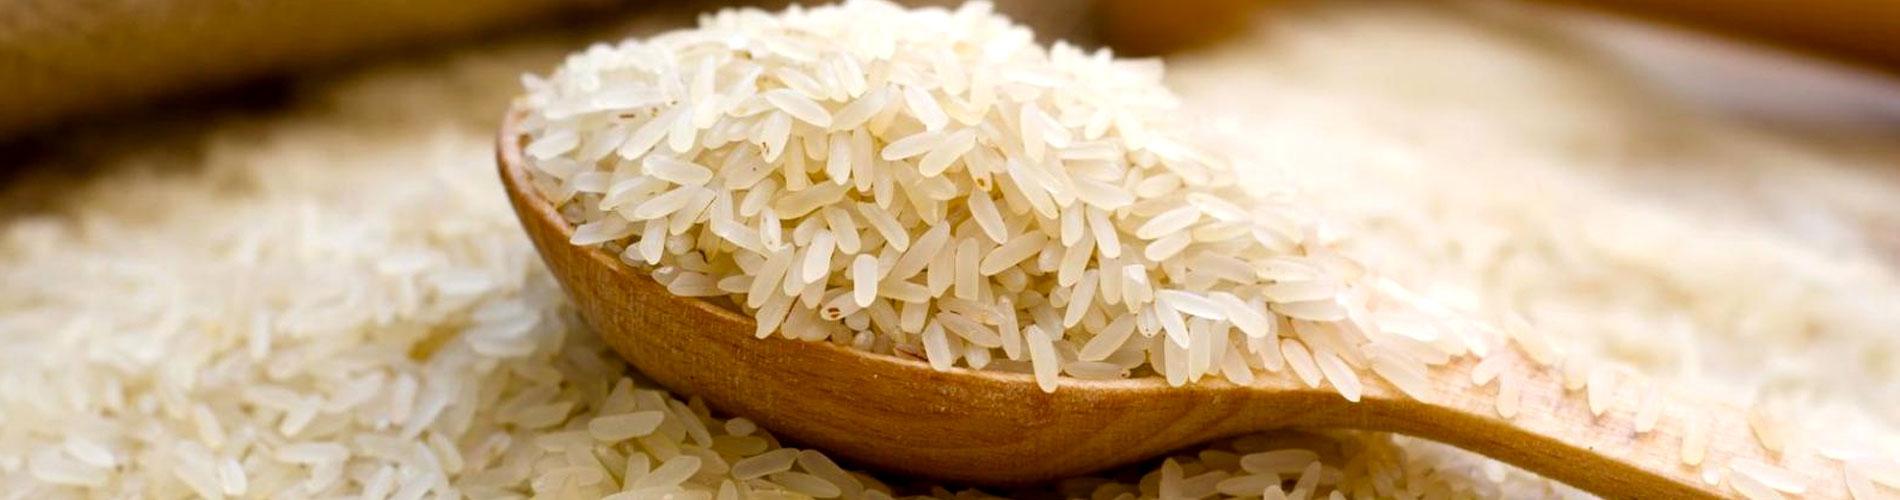 Rice sellers in Tamilnadu, india   Rice suppliers Tamilnadu